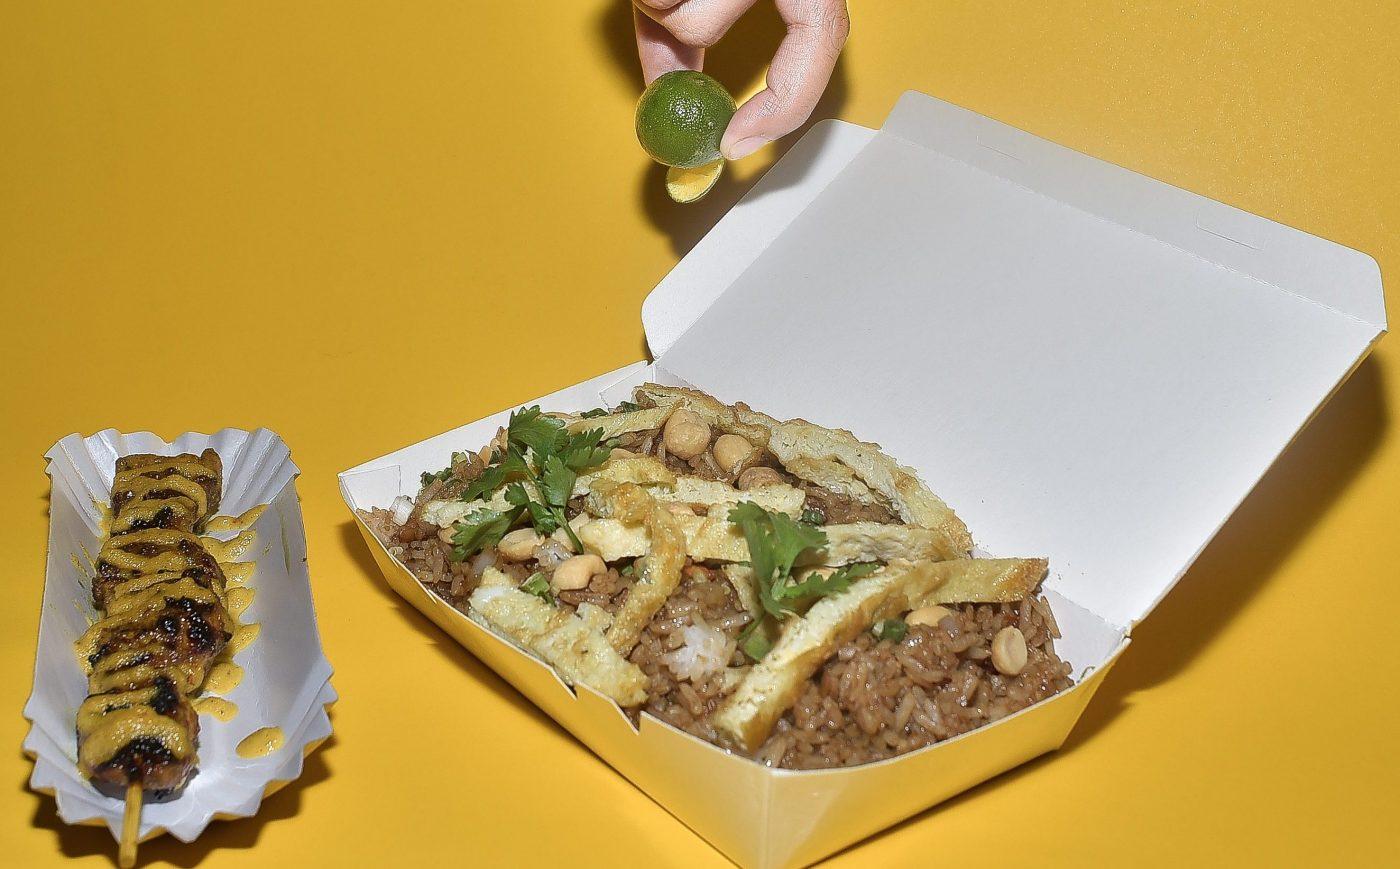 No, Merkanto is not your trendy food park. It's something better